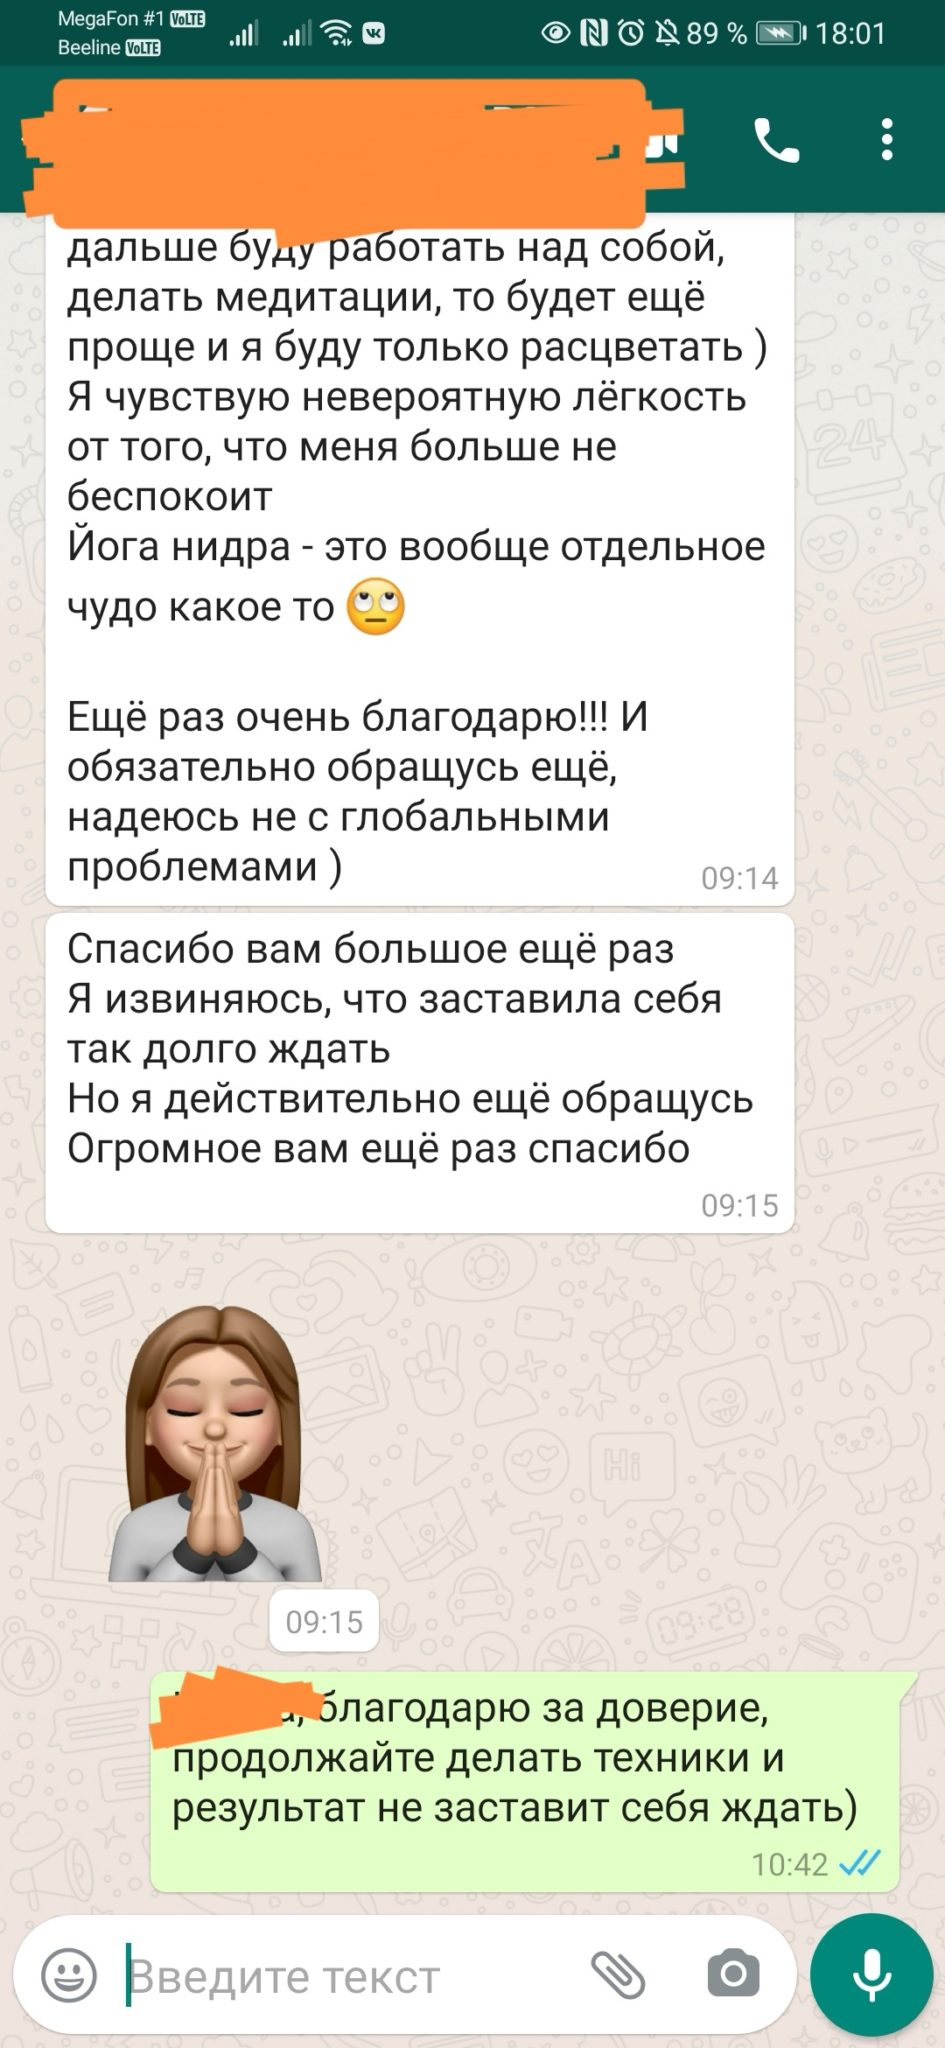 Screenshot_20210613_180158_com.whatsapp_edit_125426644219402